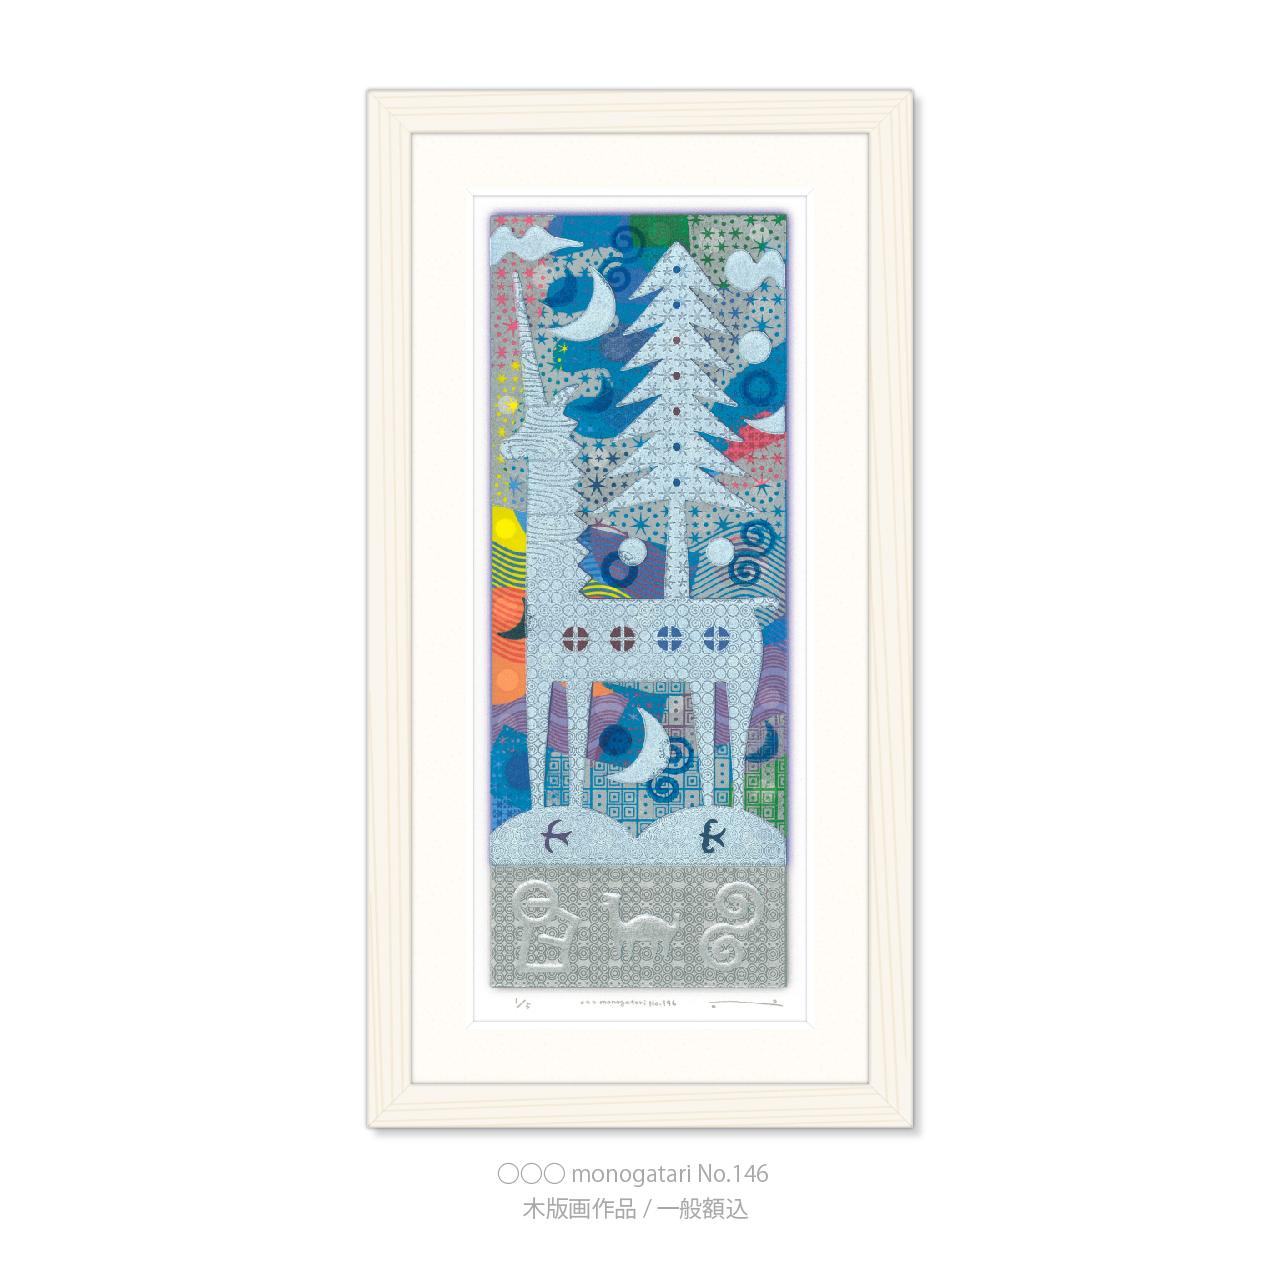 ○○○ monogatari No.146